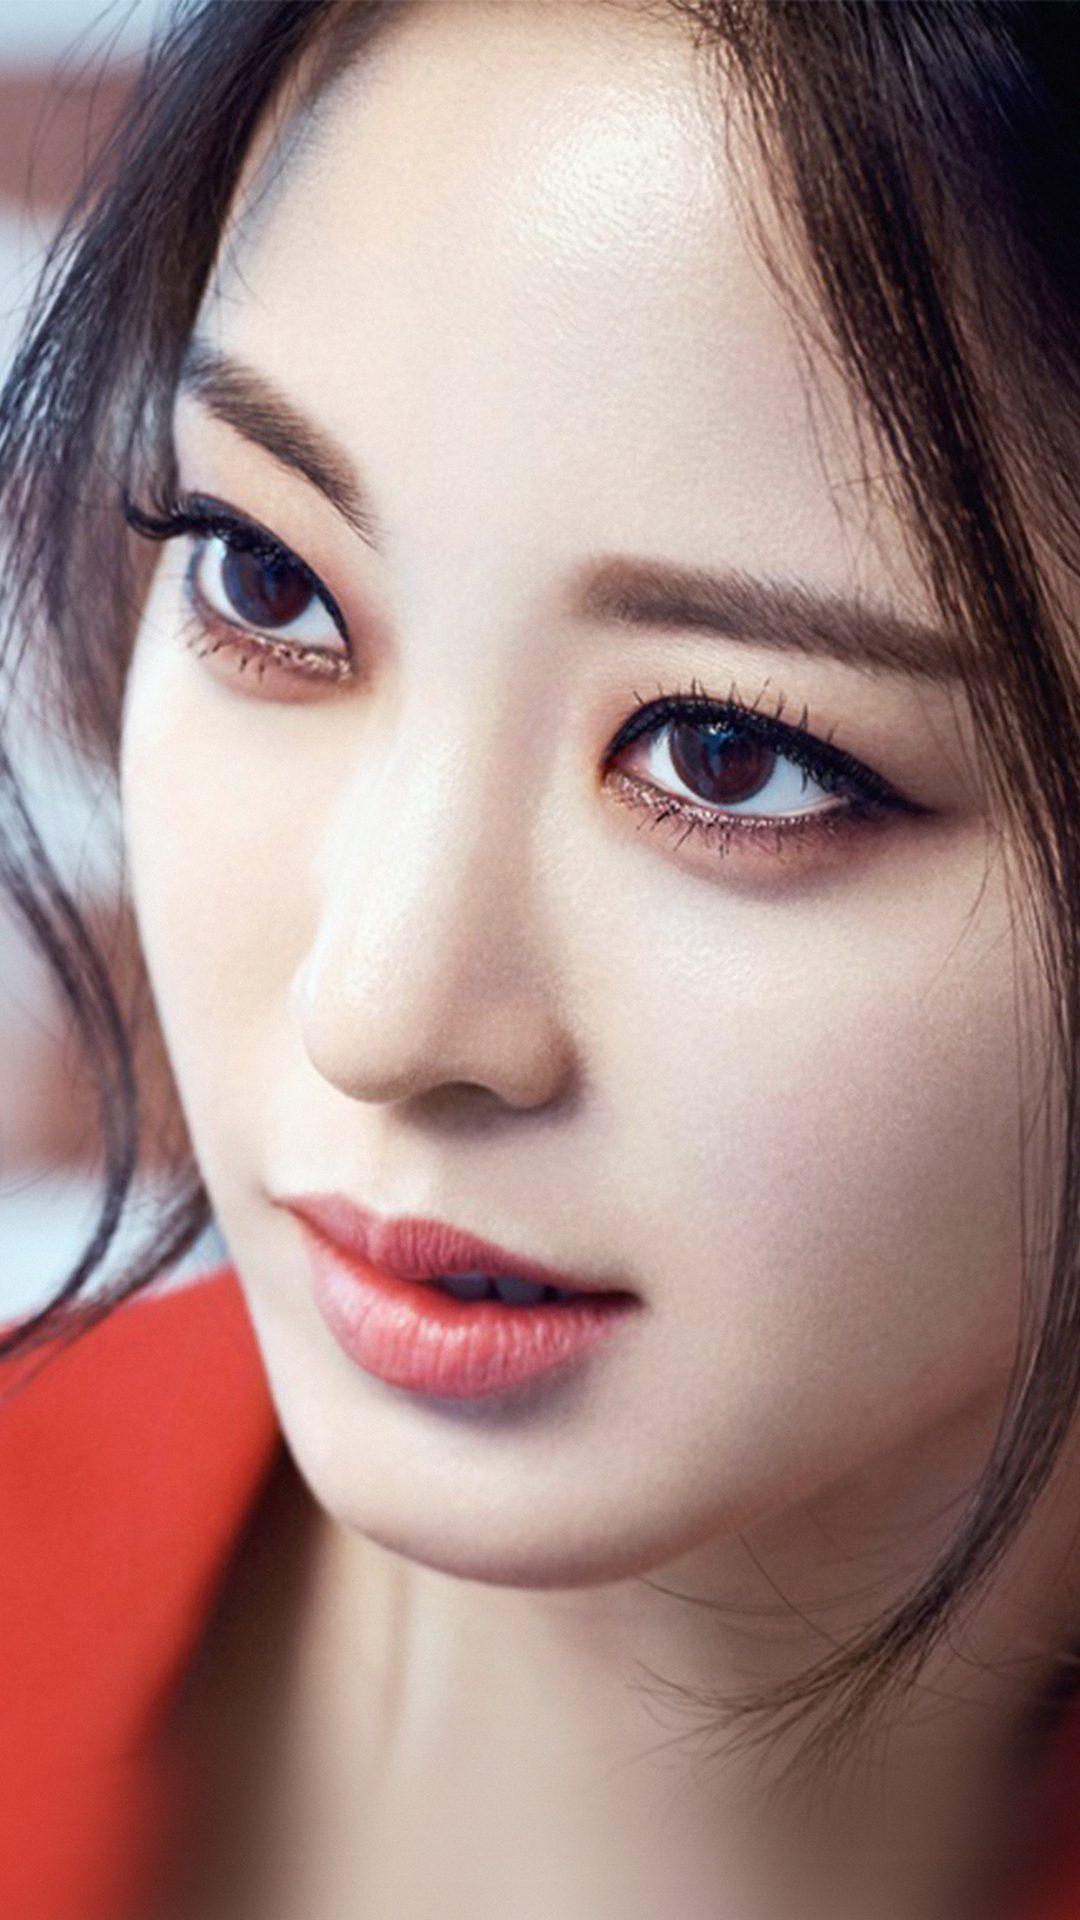 Yesul Kpop Beauty Celebrity Face